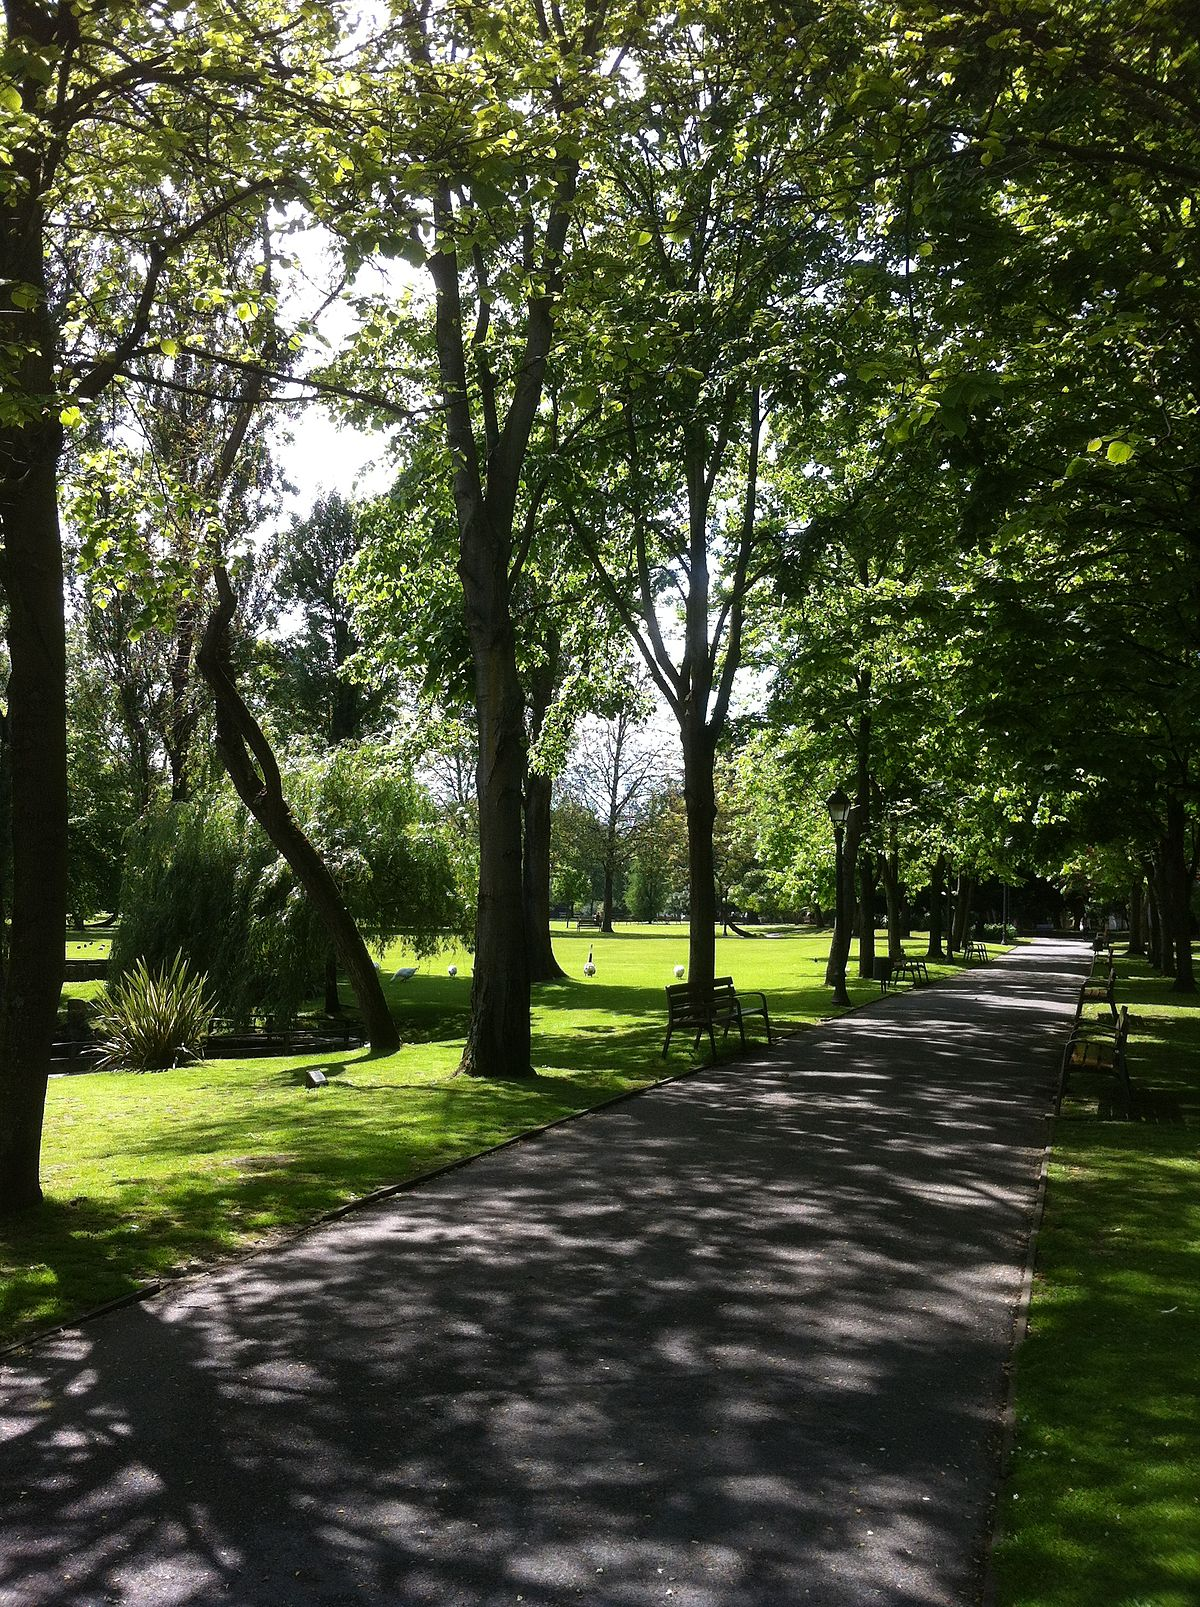 Parque de Ferrera Wikipedia, la enciclopedia libre